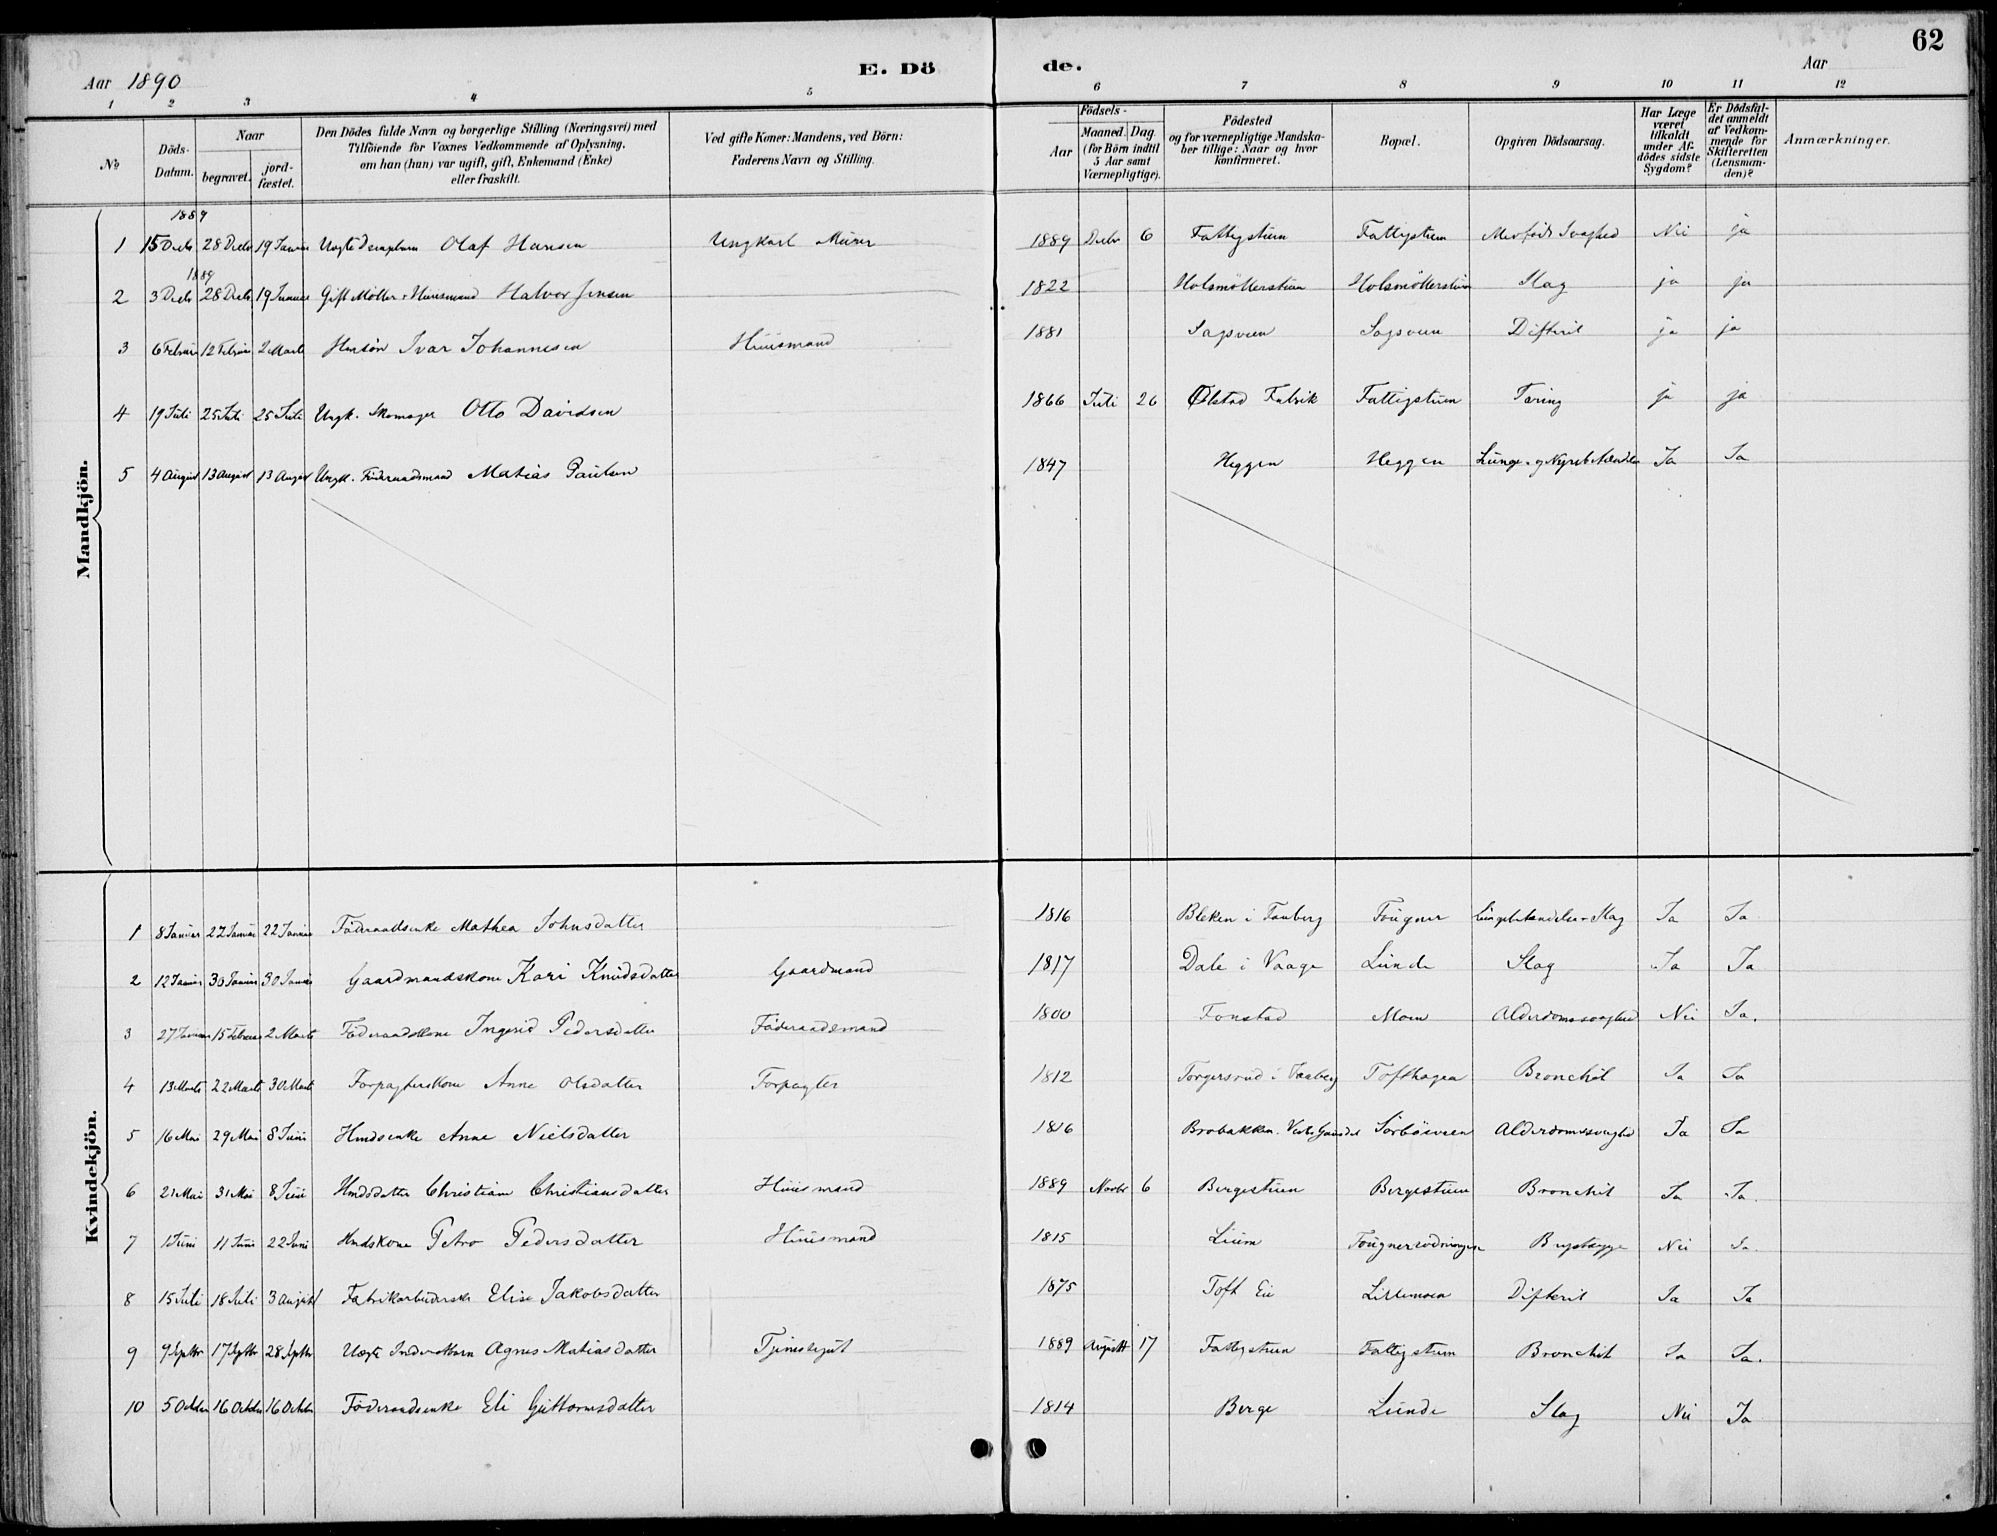 SAH, Østre Gausdal prestekontor, Ministerialbok nr. 3, 1887-1901, s. 62